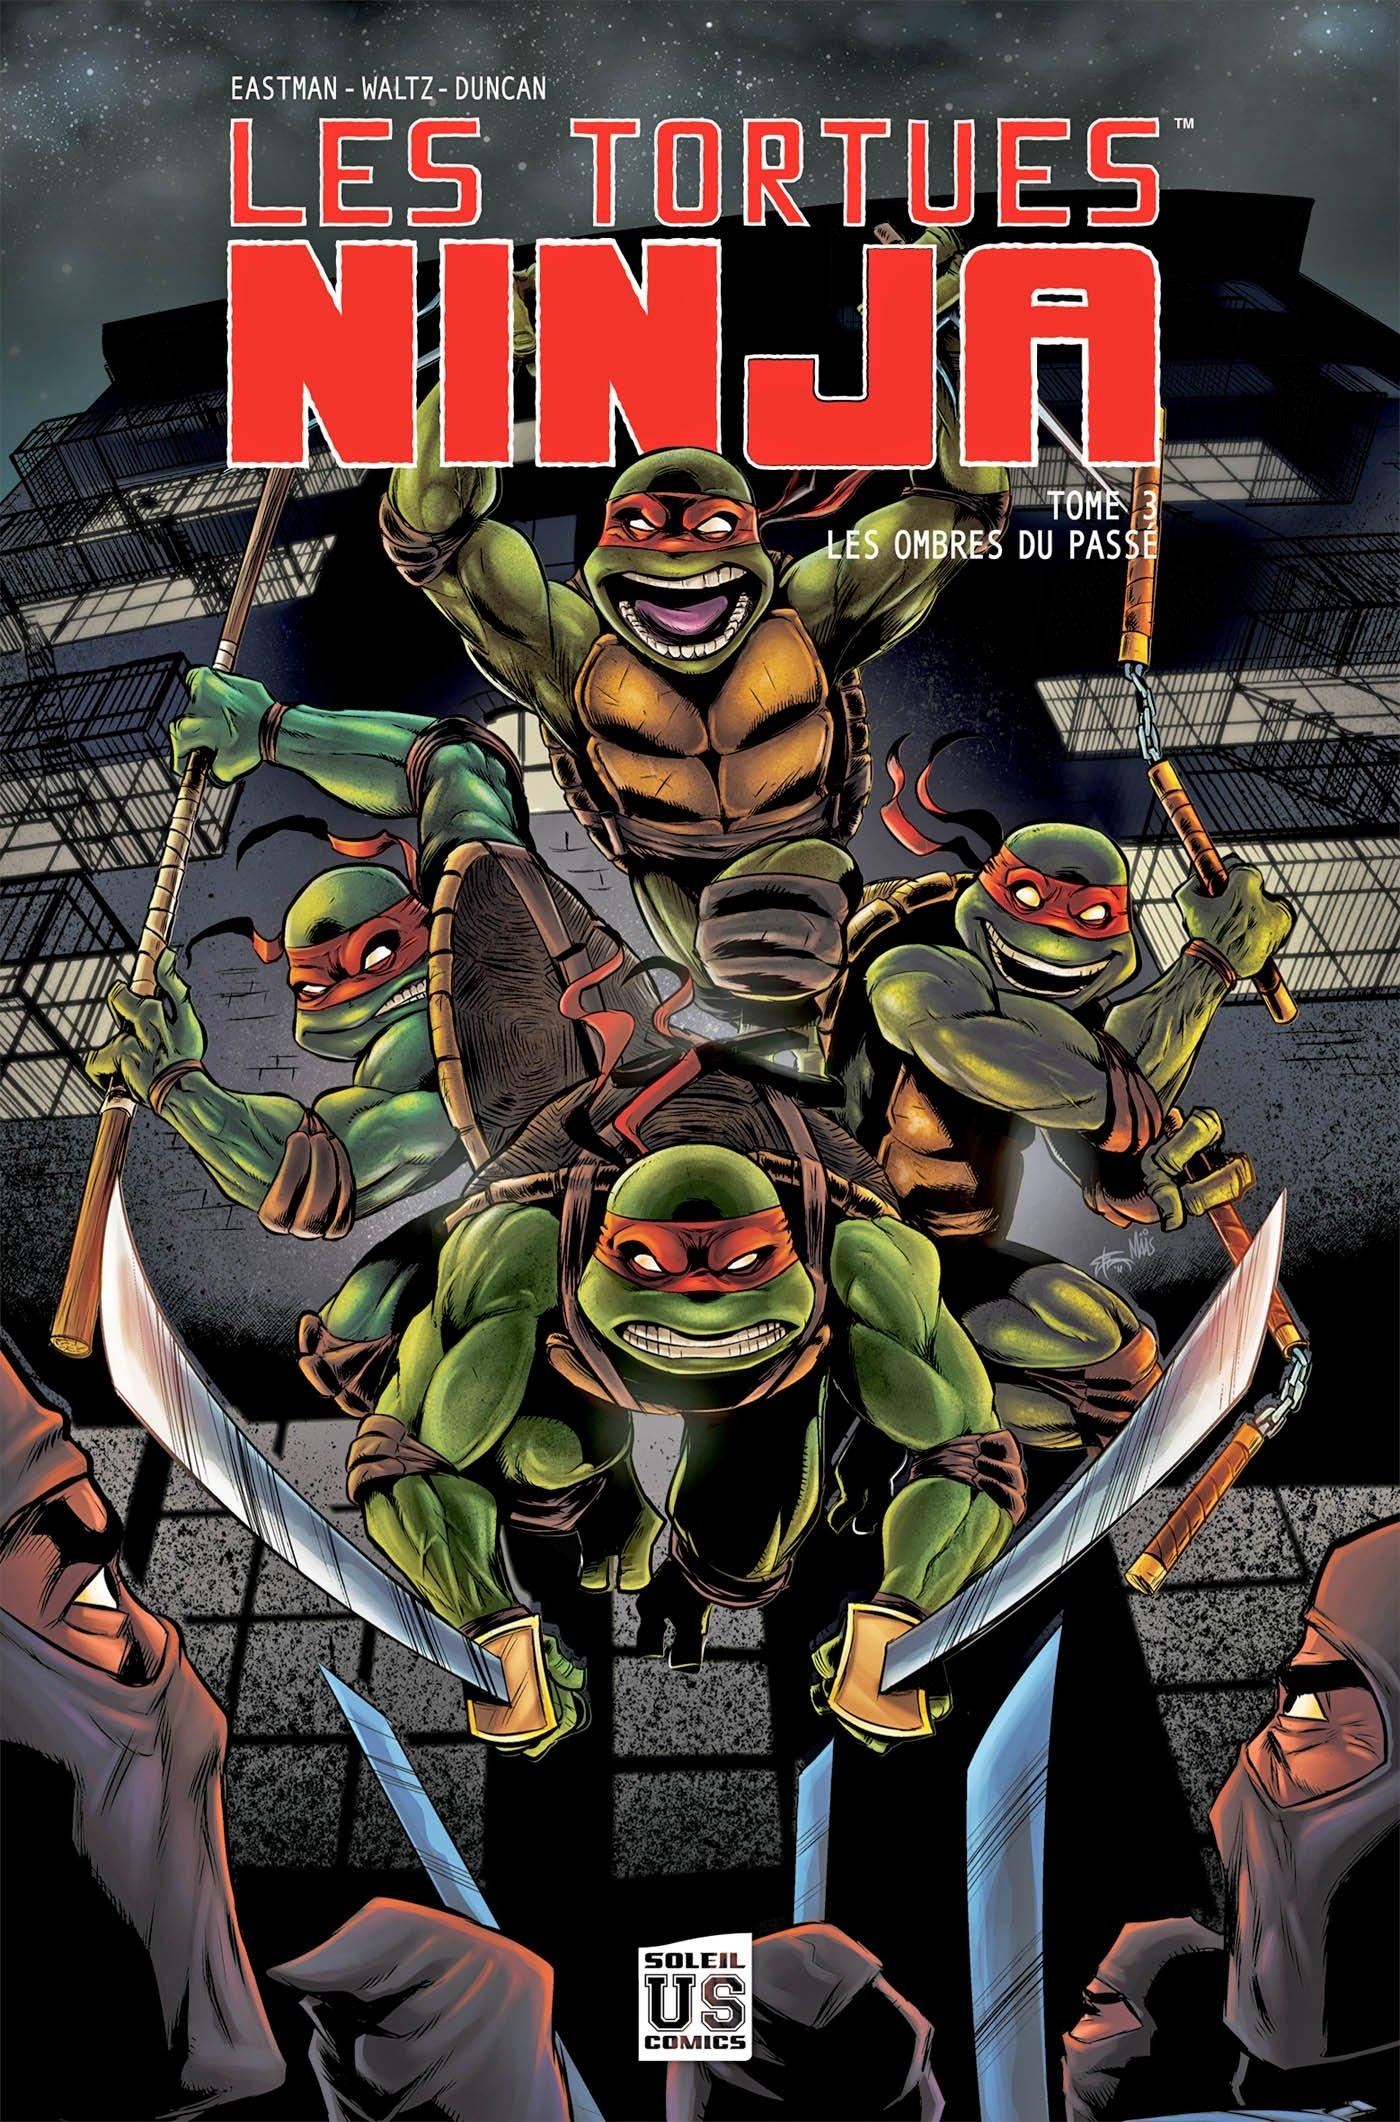 Les Tortues Ninja, Tome 3 : Les ombres du passé: Kevin ...